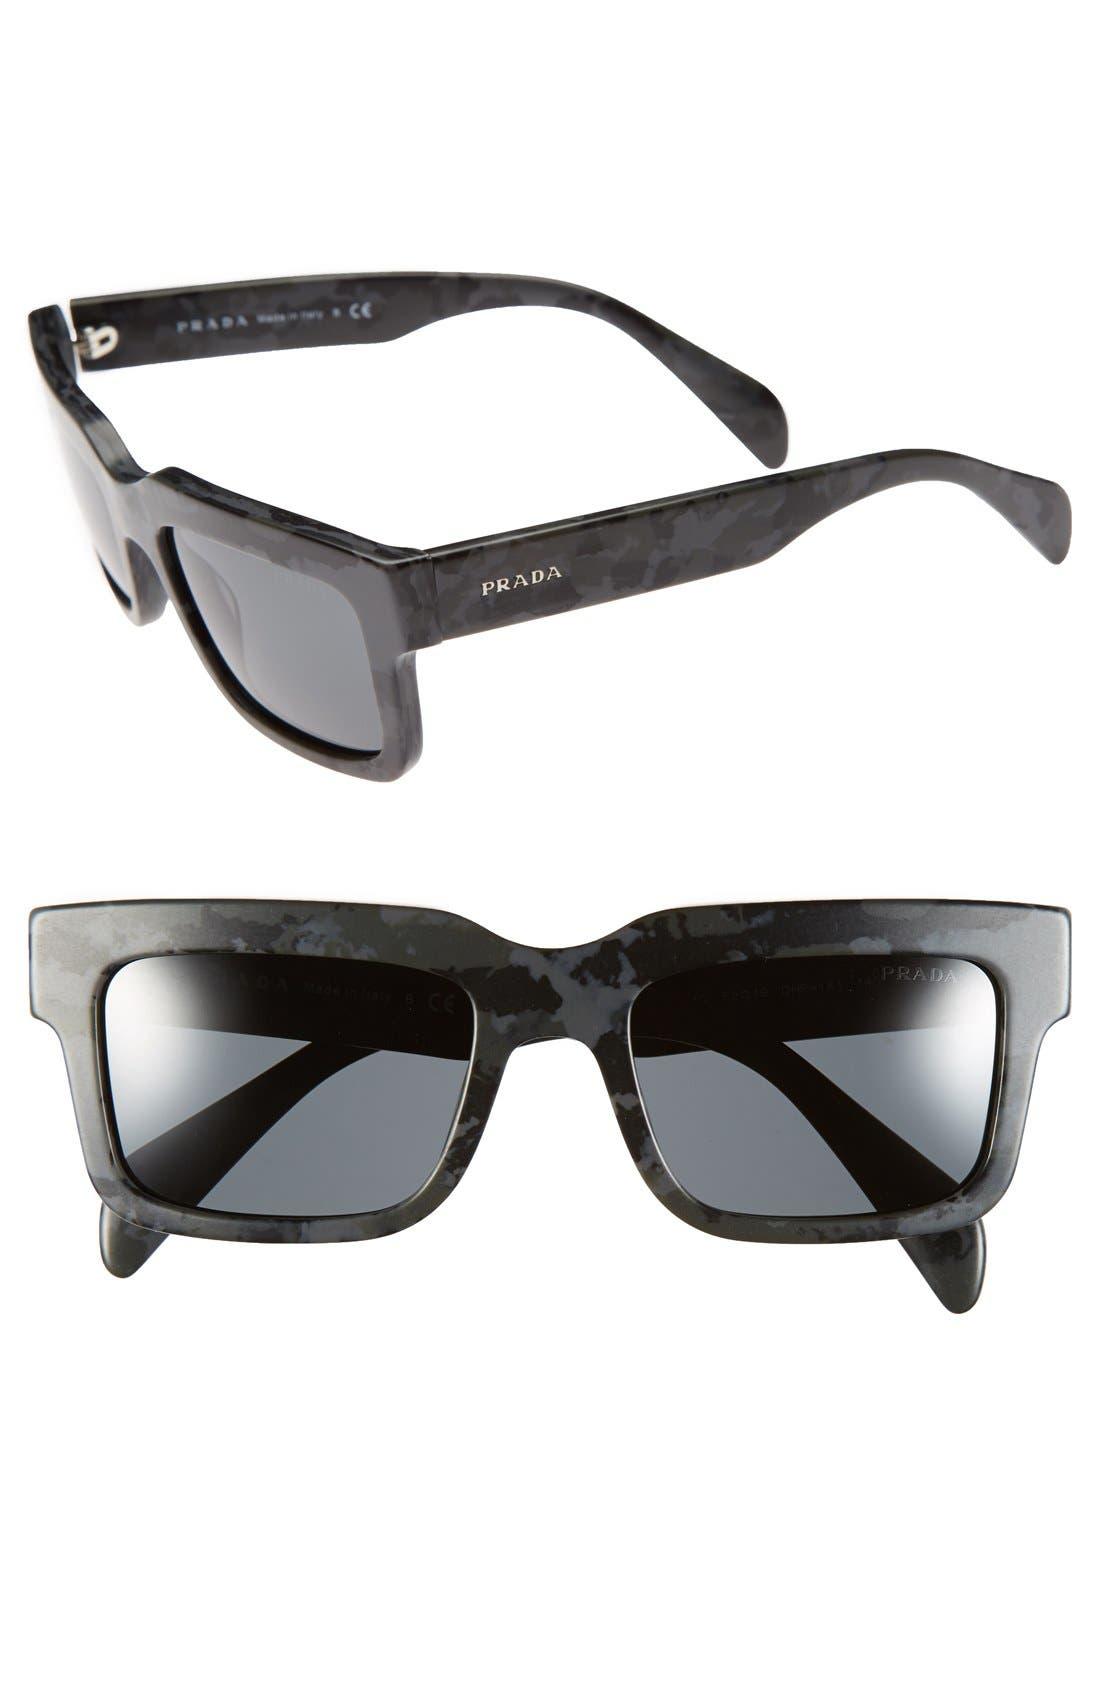 Main Image - kensie 'Kinley' 53mm Polarized Sunglasses